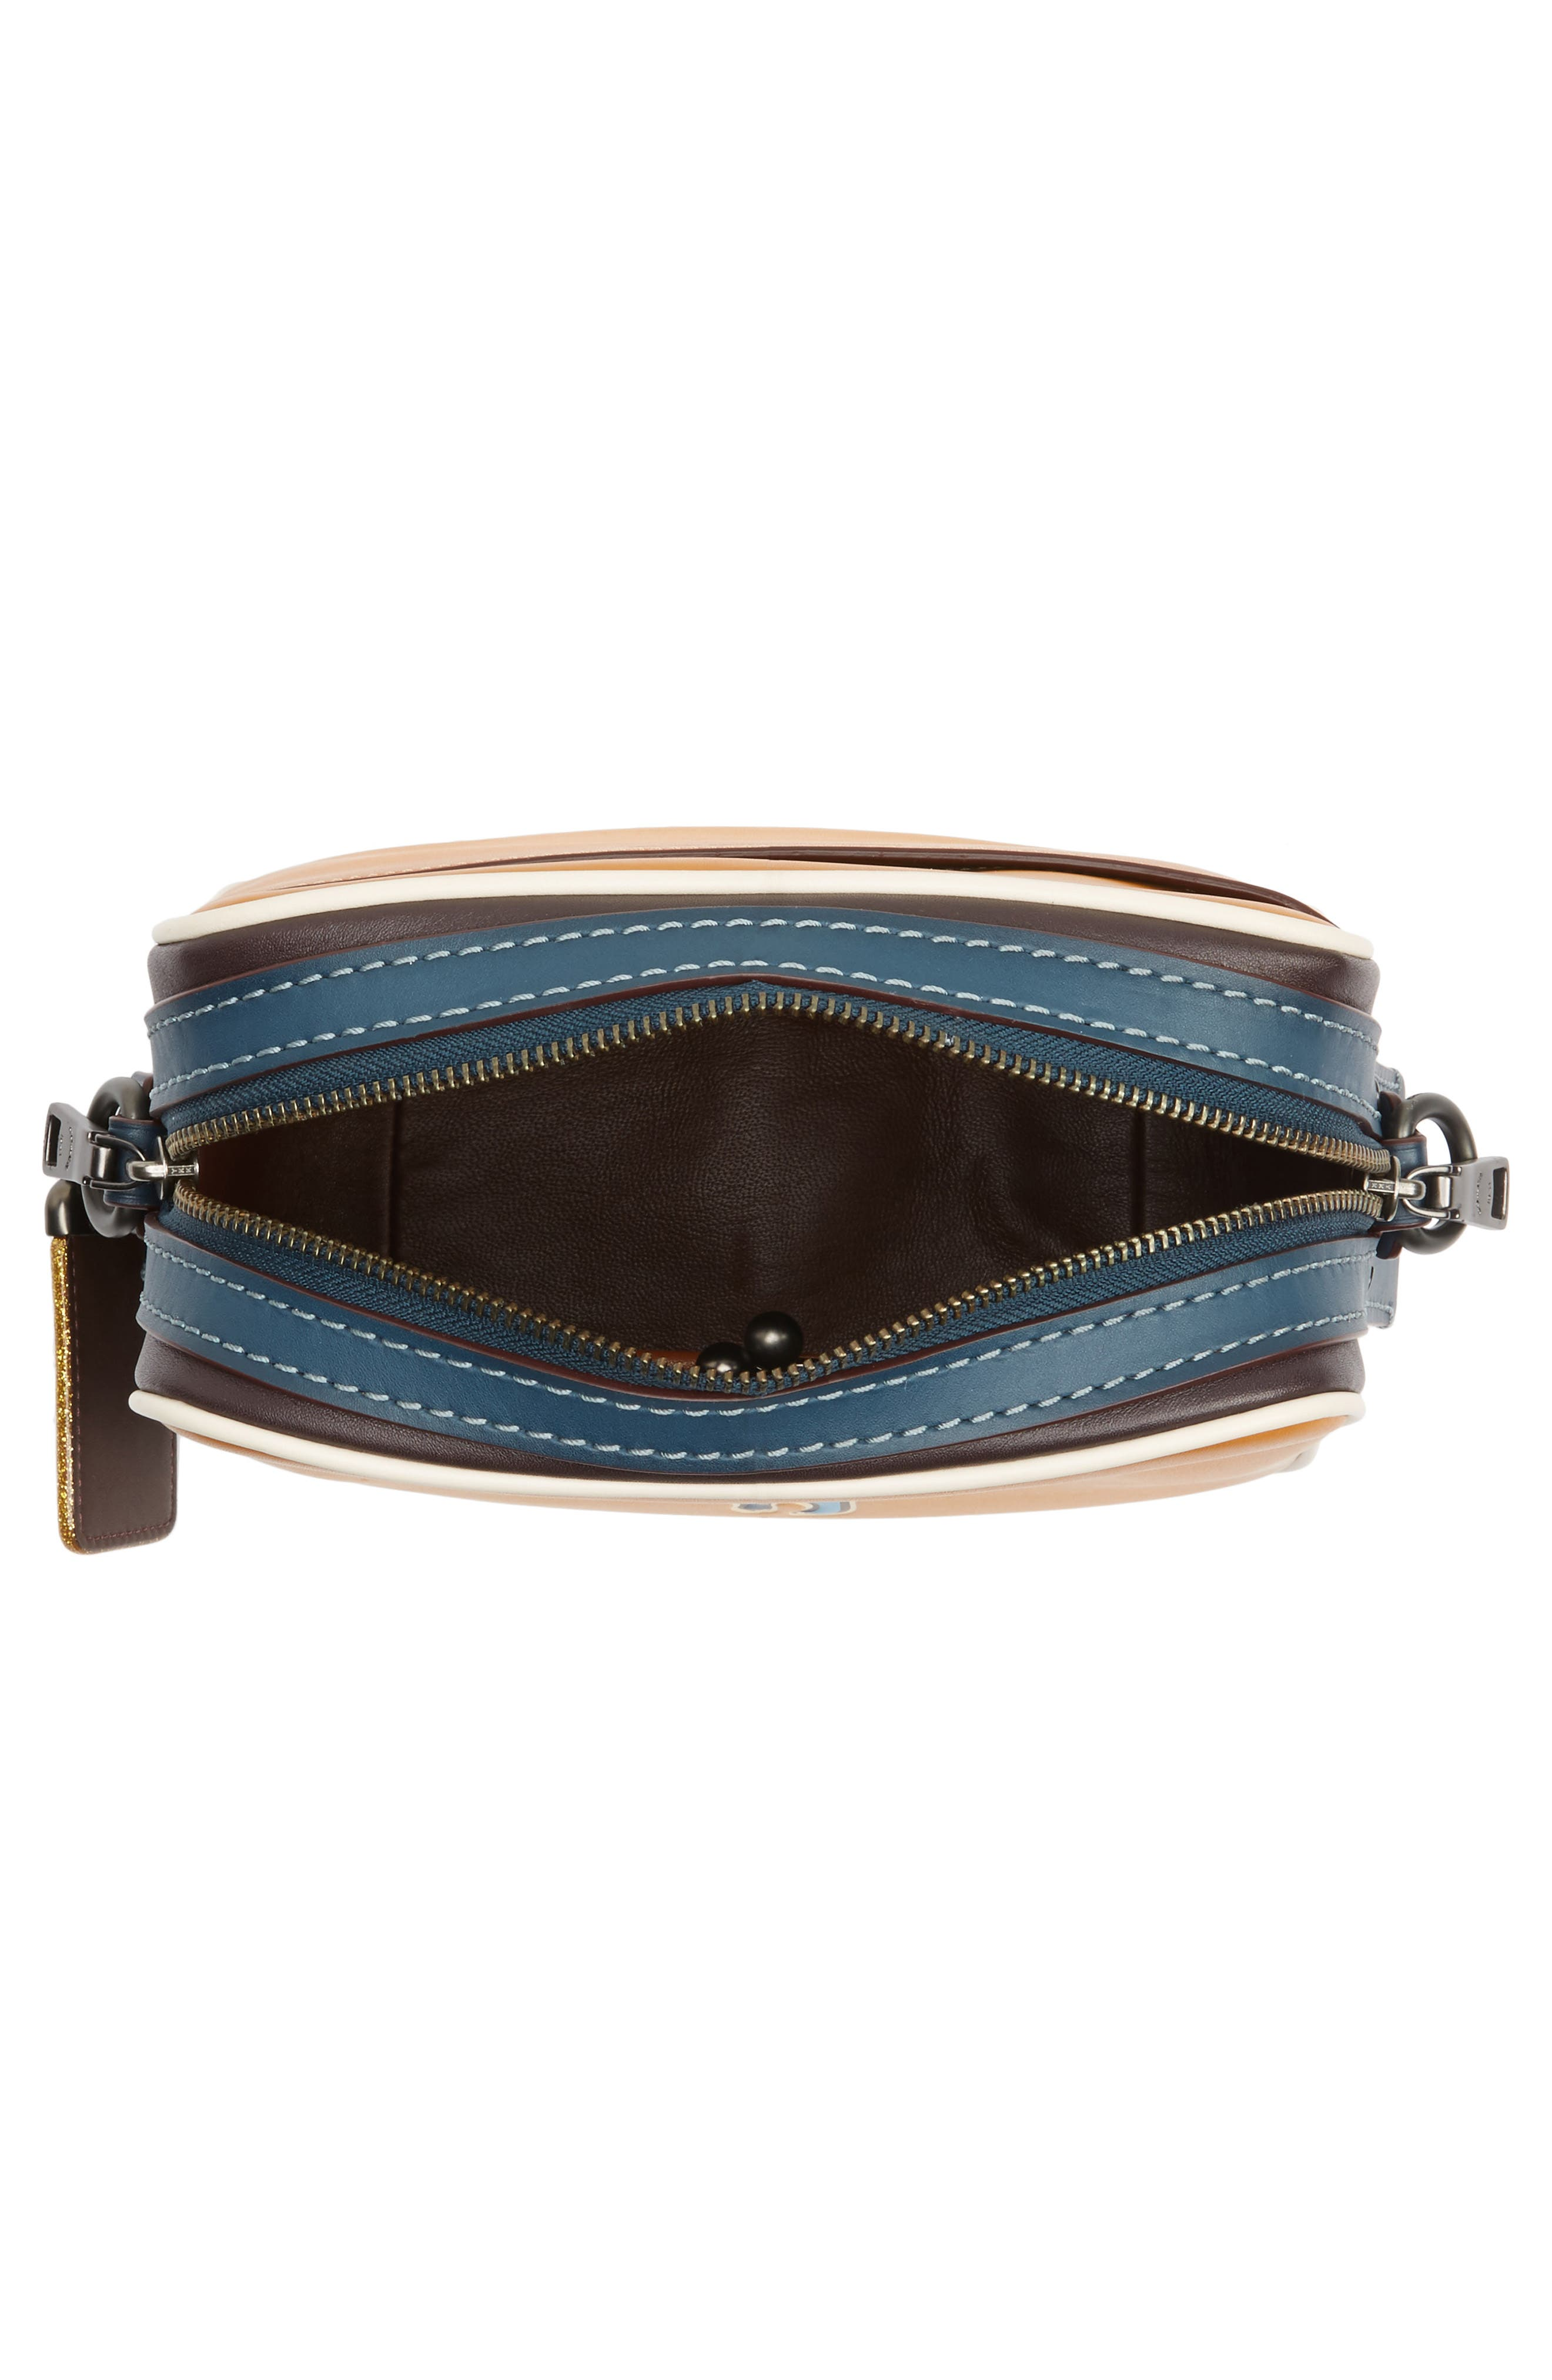 Rexy Leather Crossbody Bag,                             Alternate thumbnail 4, color,                             720